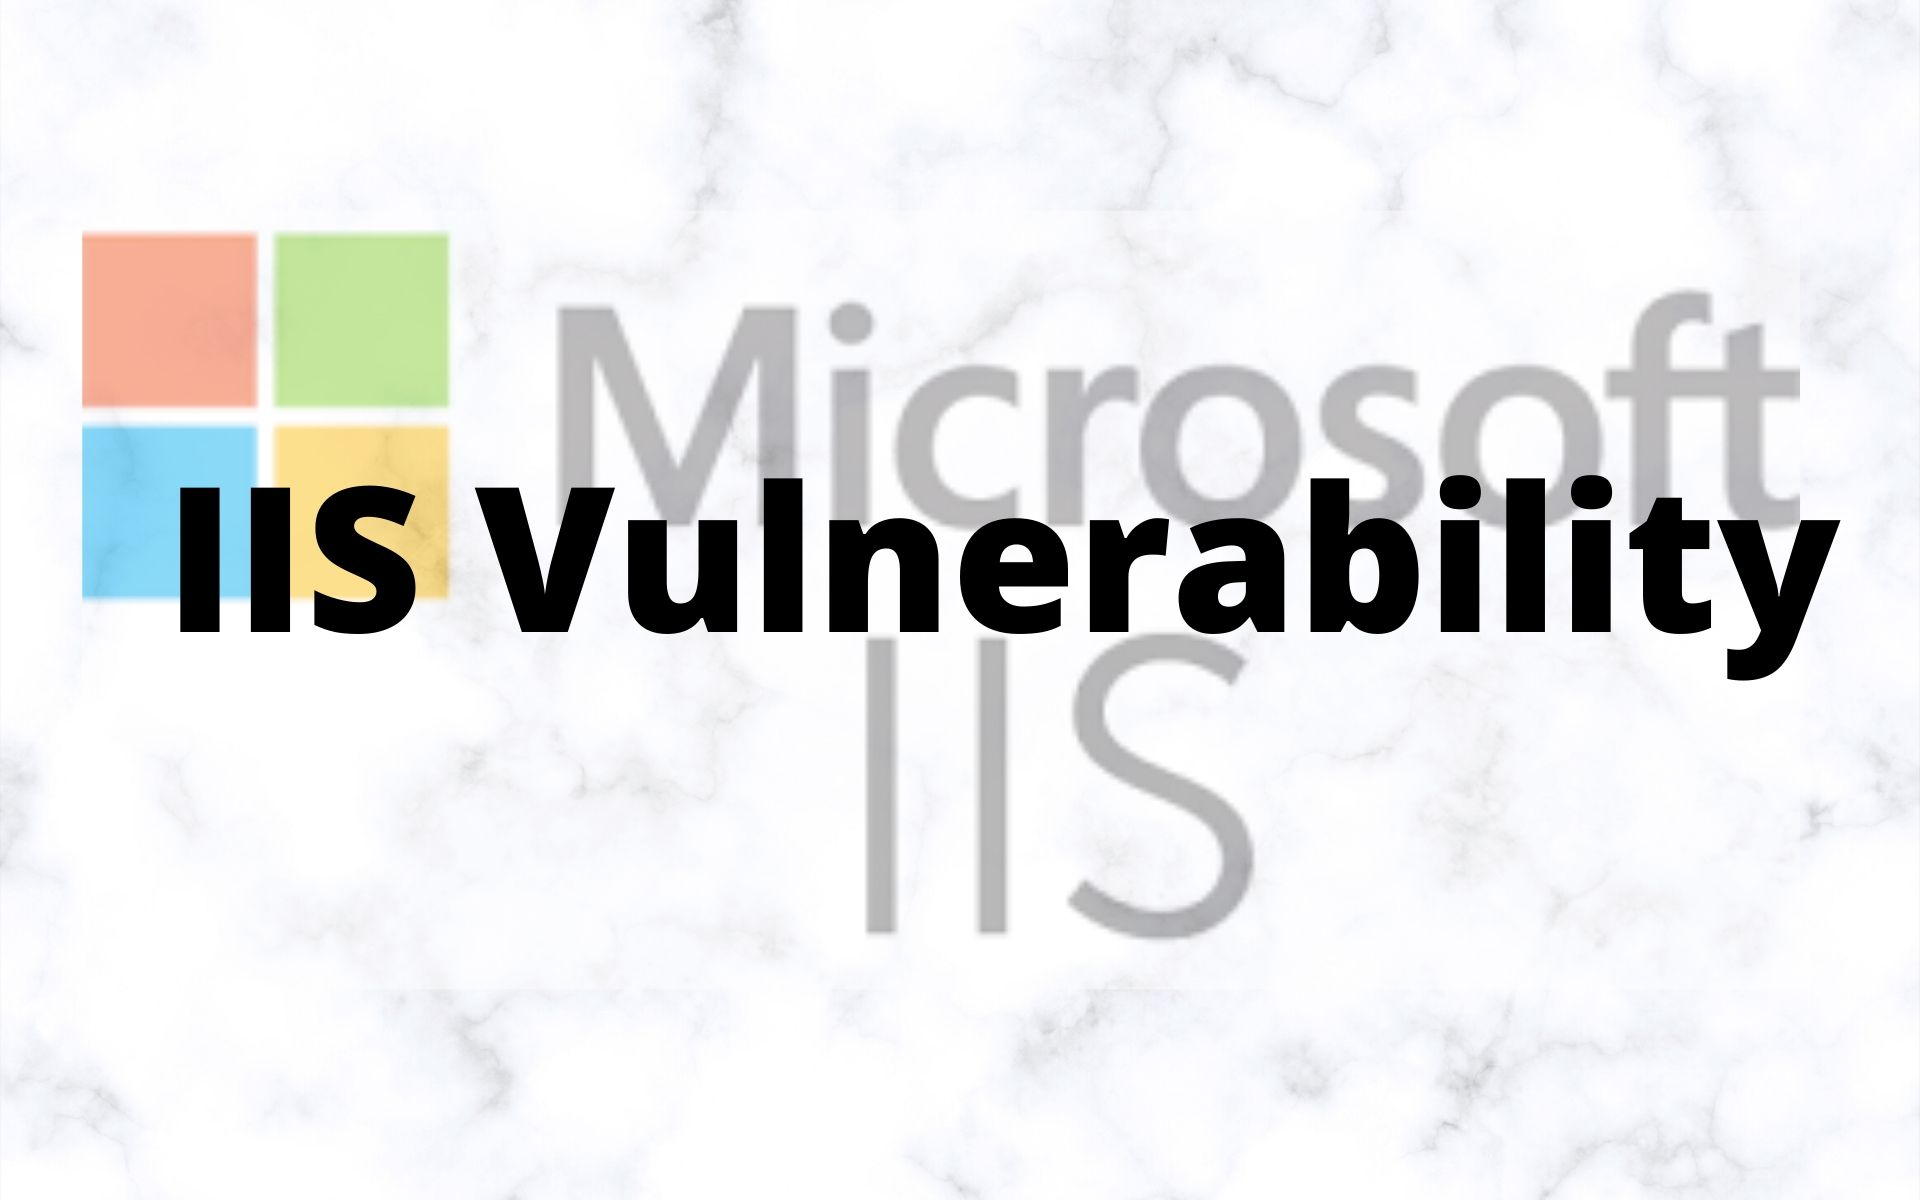 IIS Vulnerability